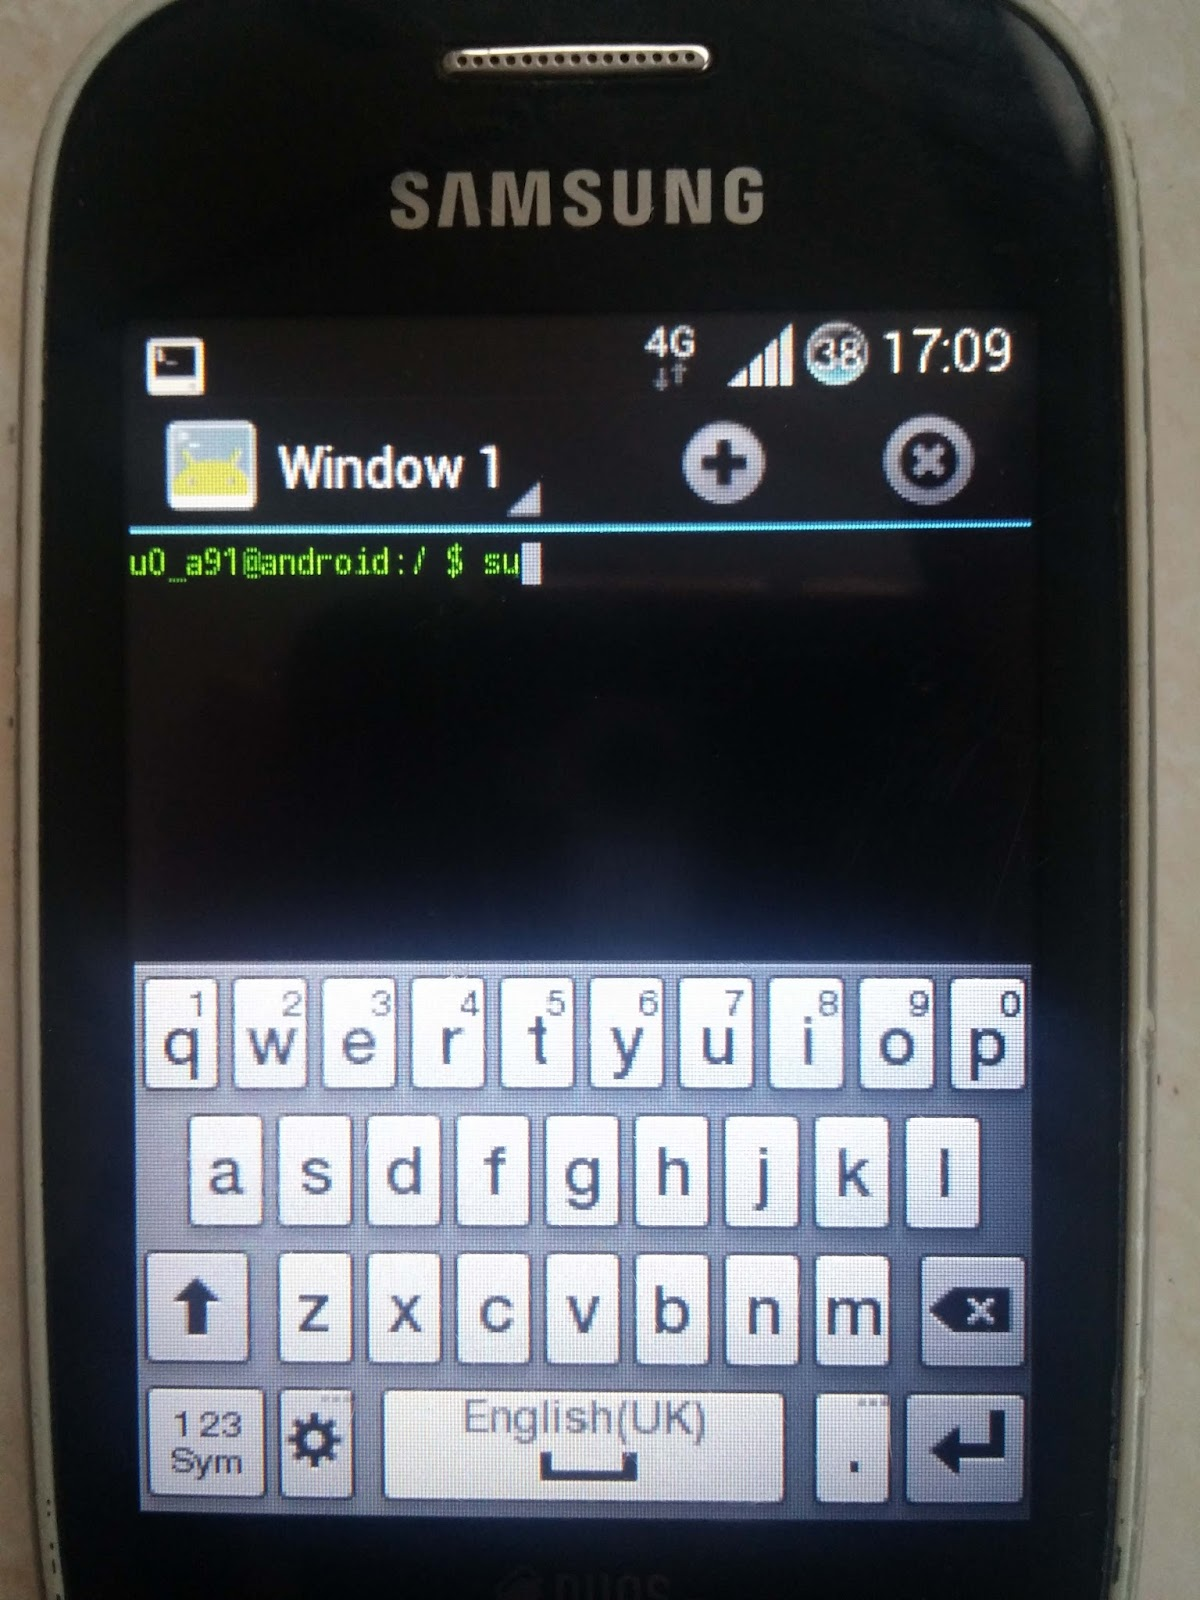 Tutorial Cara Root Samsung Galaxy Star Gt S5282 S5280 Sansung Duos